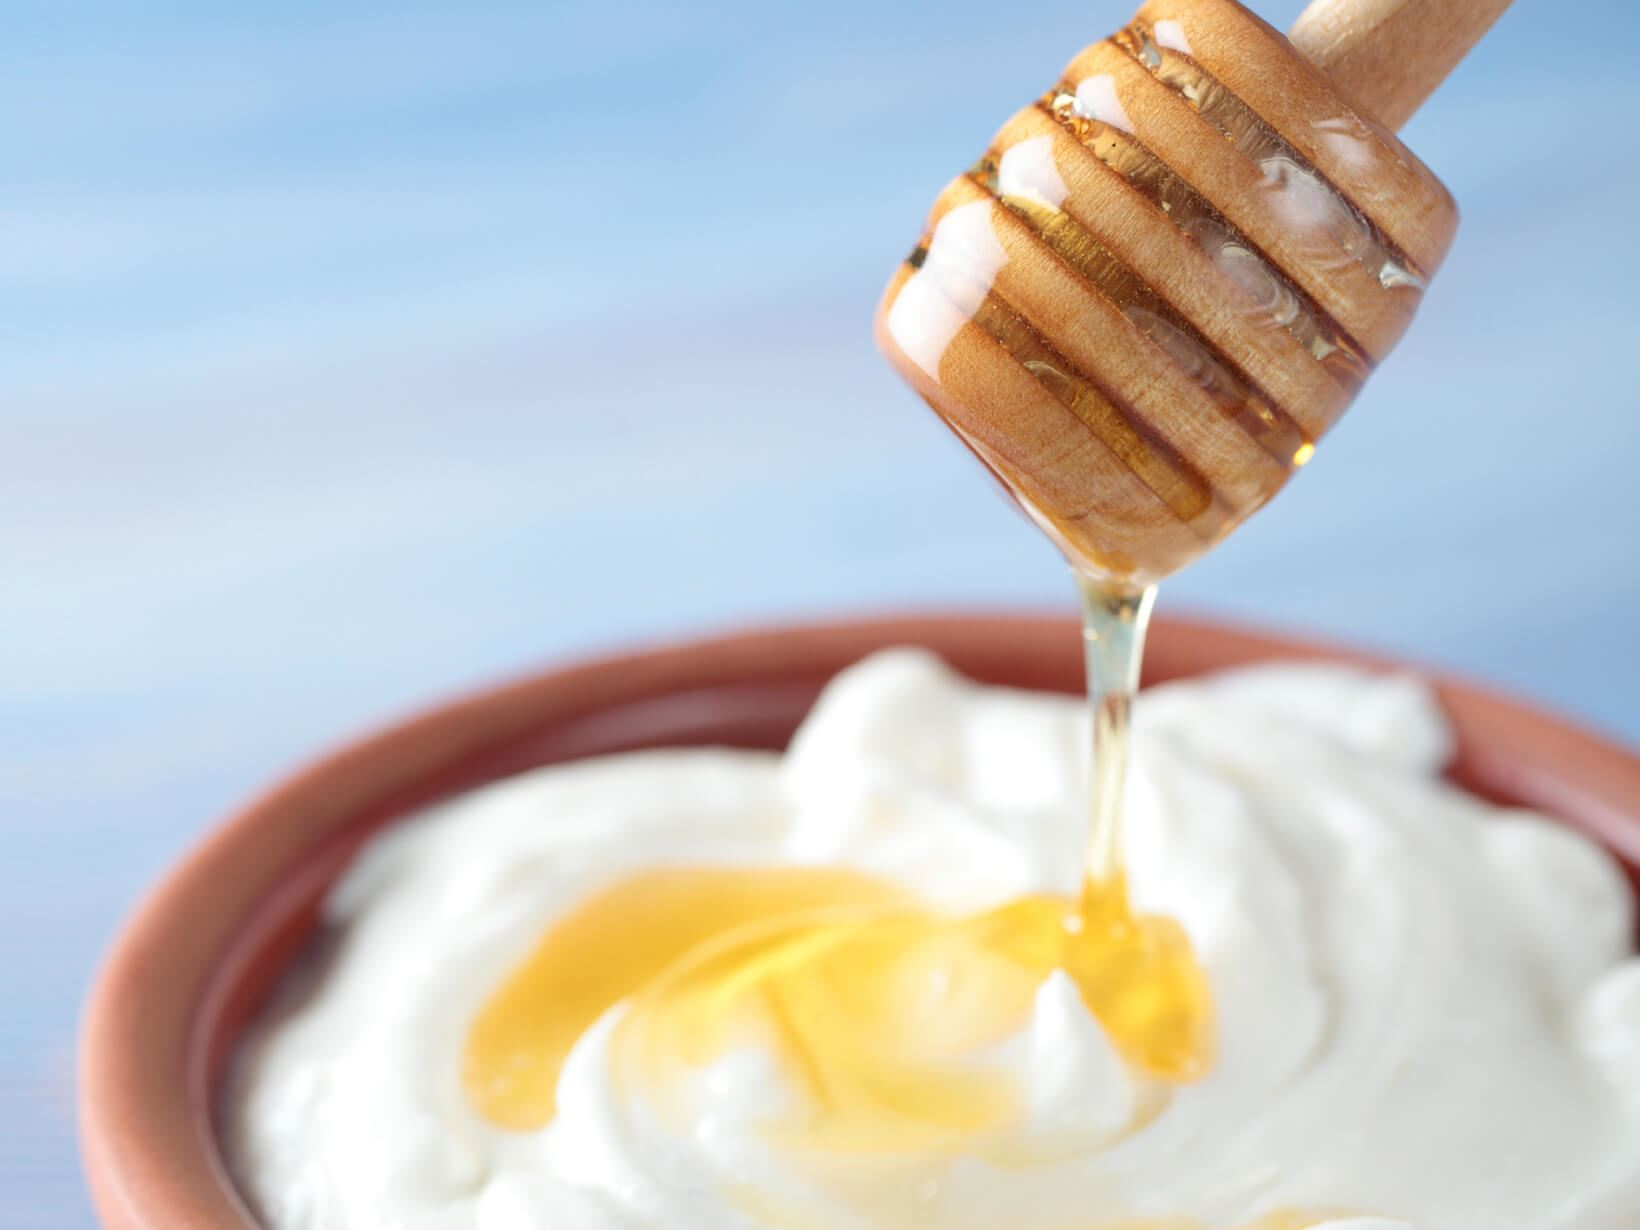 Мёд, сметана и суши в жизни человека